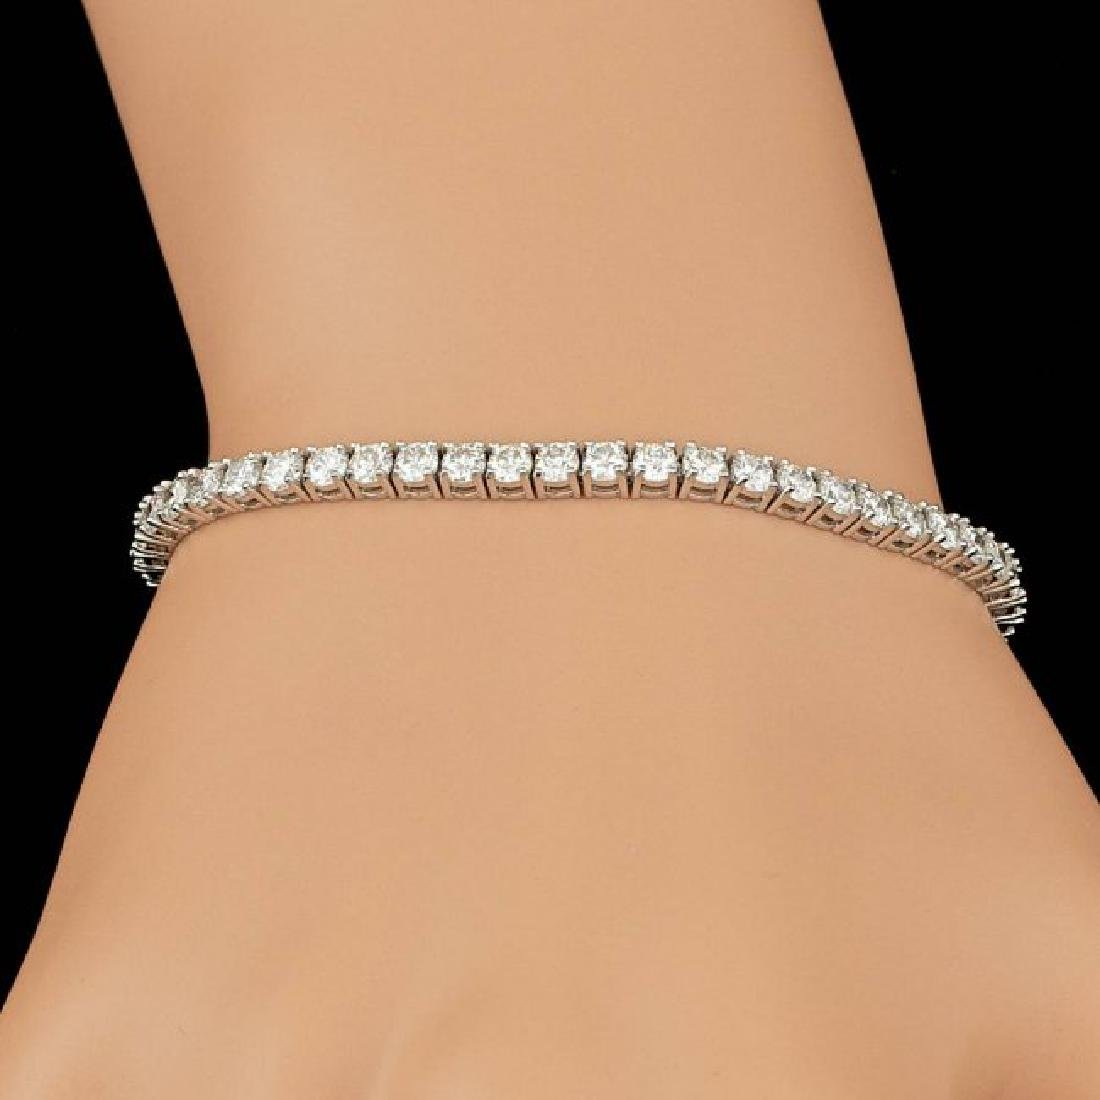 18k White Gold 6.00ct Diamond Bracelet - 4